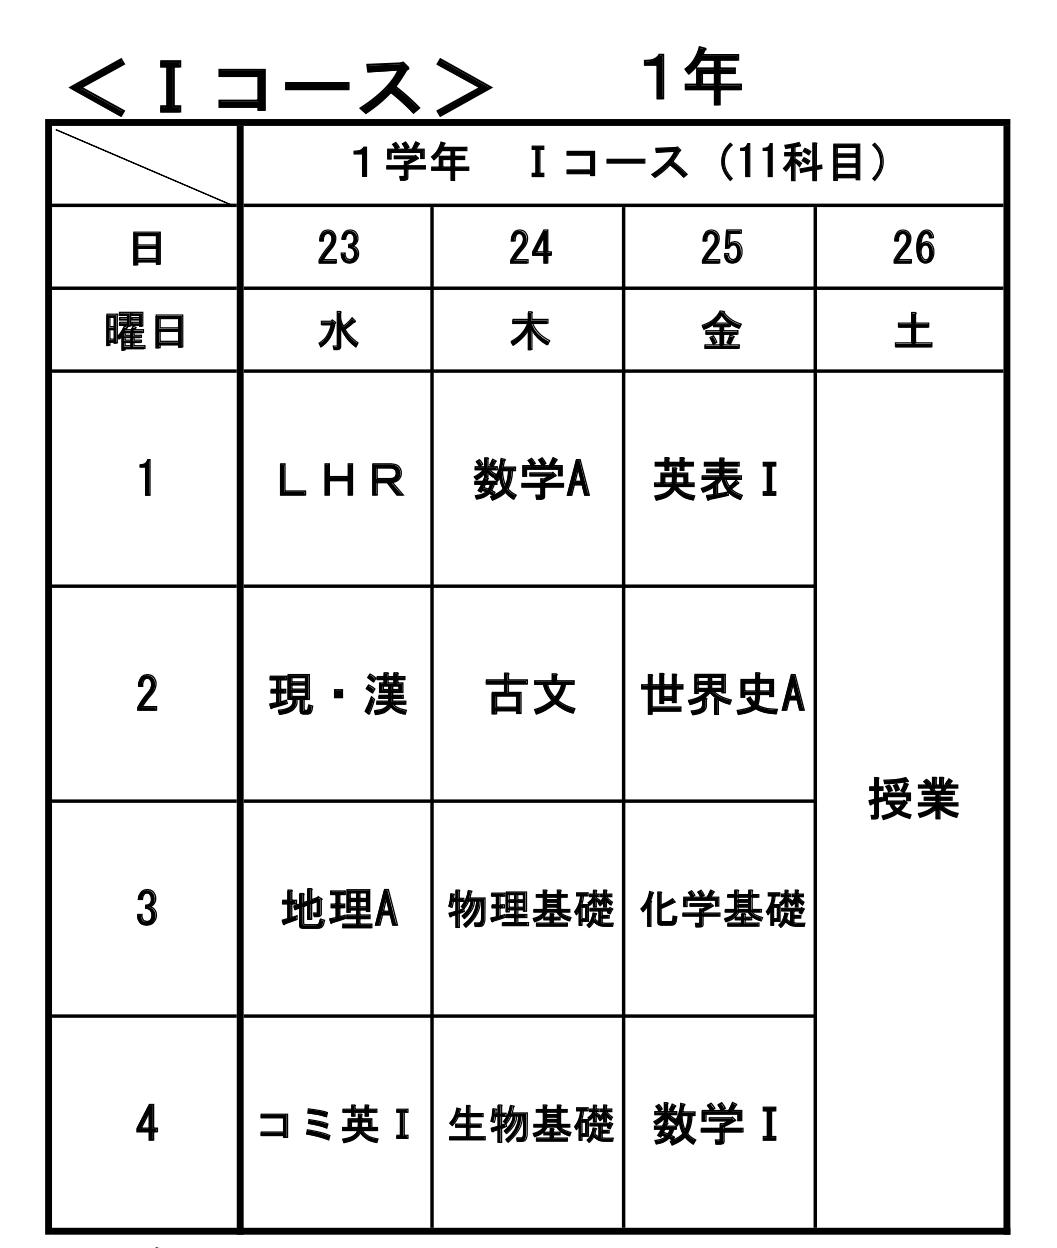 https://www.tohoku.hs.nihon-u.ac.jp/information/files/IMG-1a.jpg